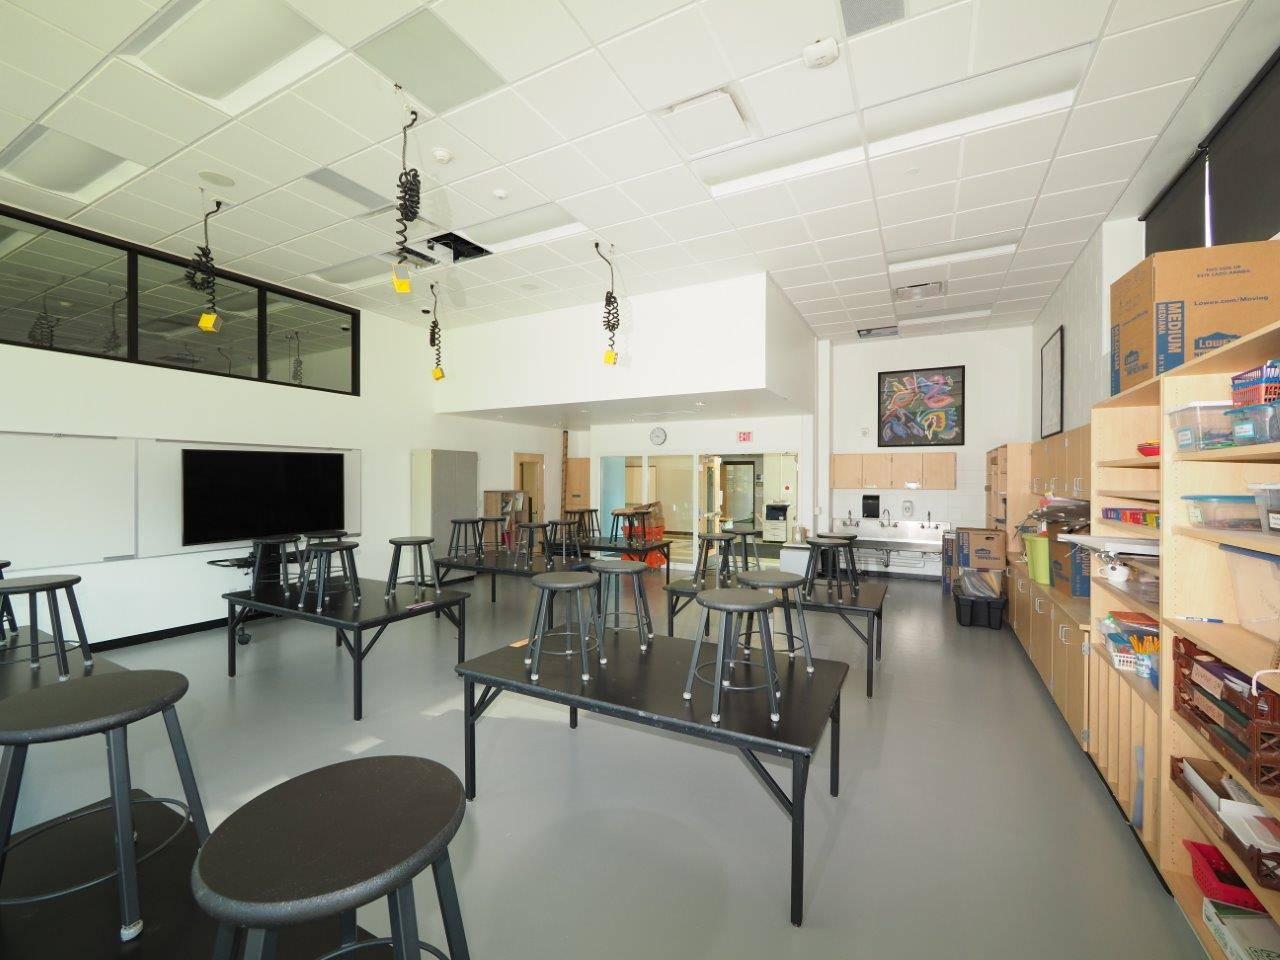 A renovated art room